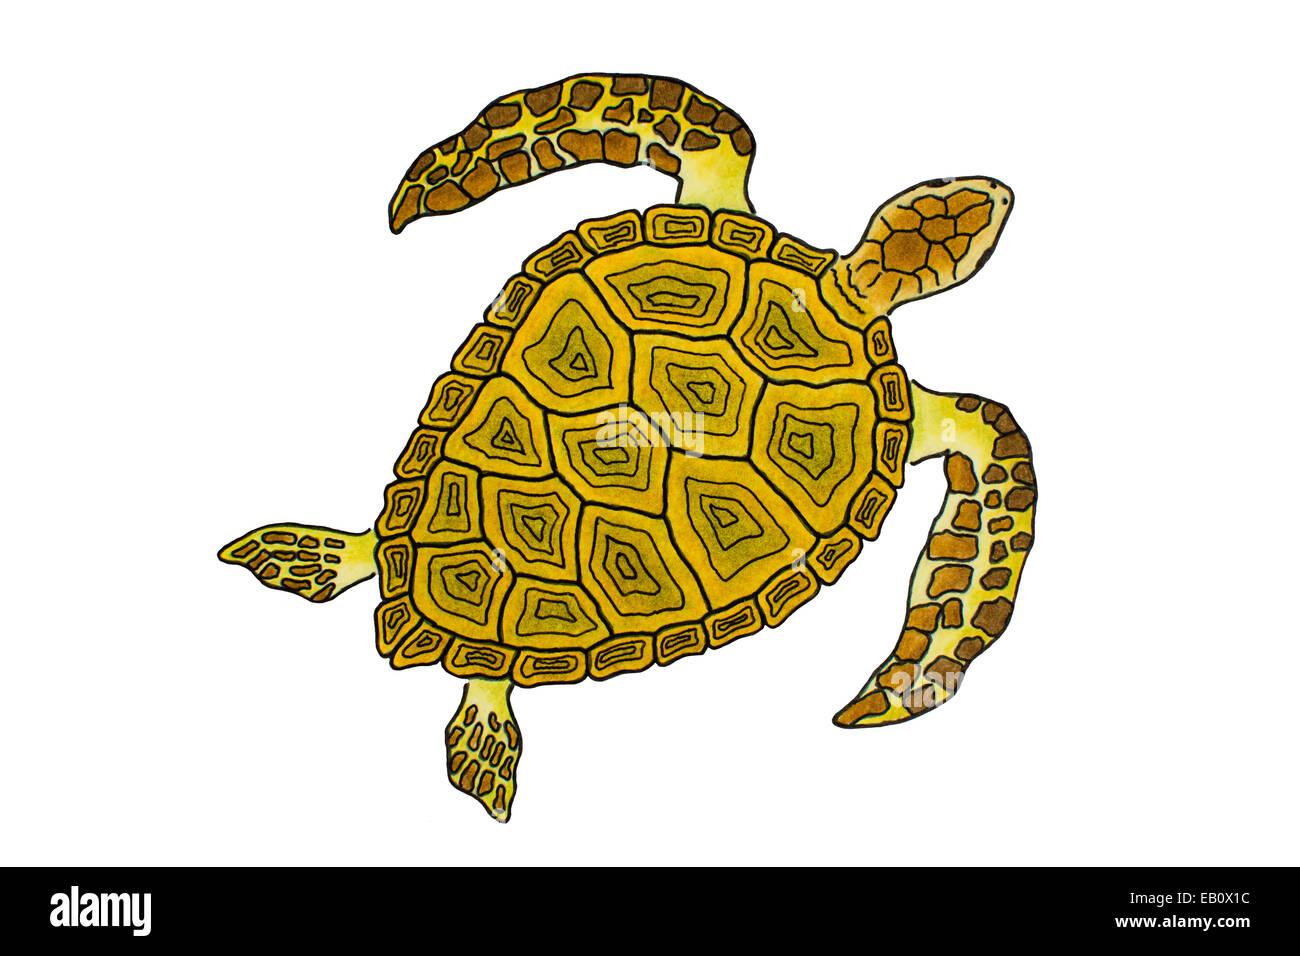 Dessin tortue de mer isol banque d 39 images photo stock 75623112 alamy - Tortue en dessin ...